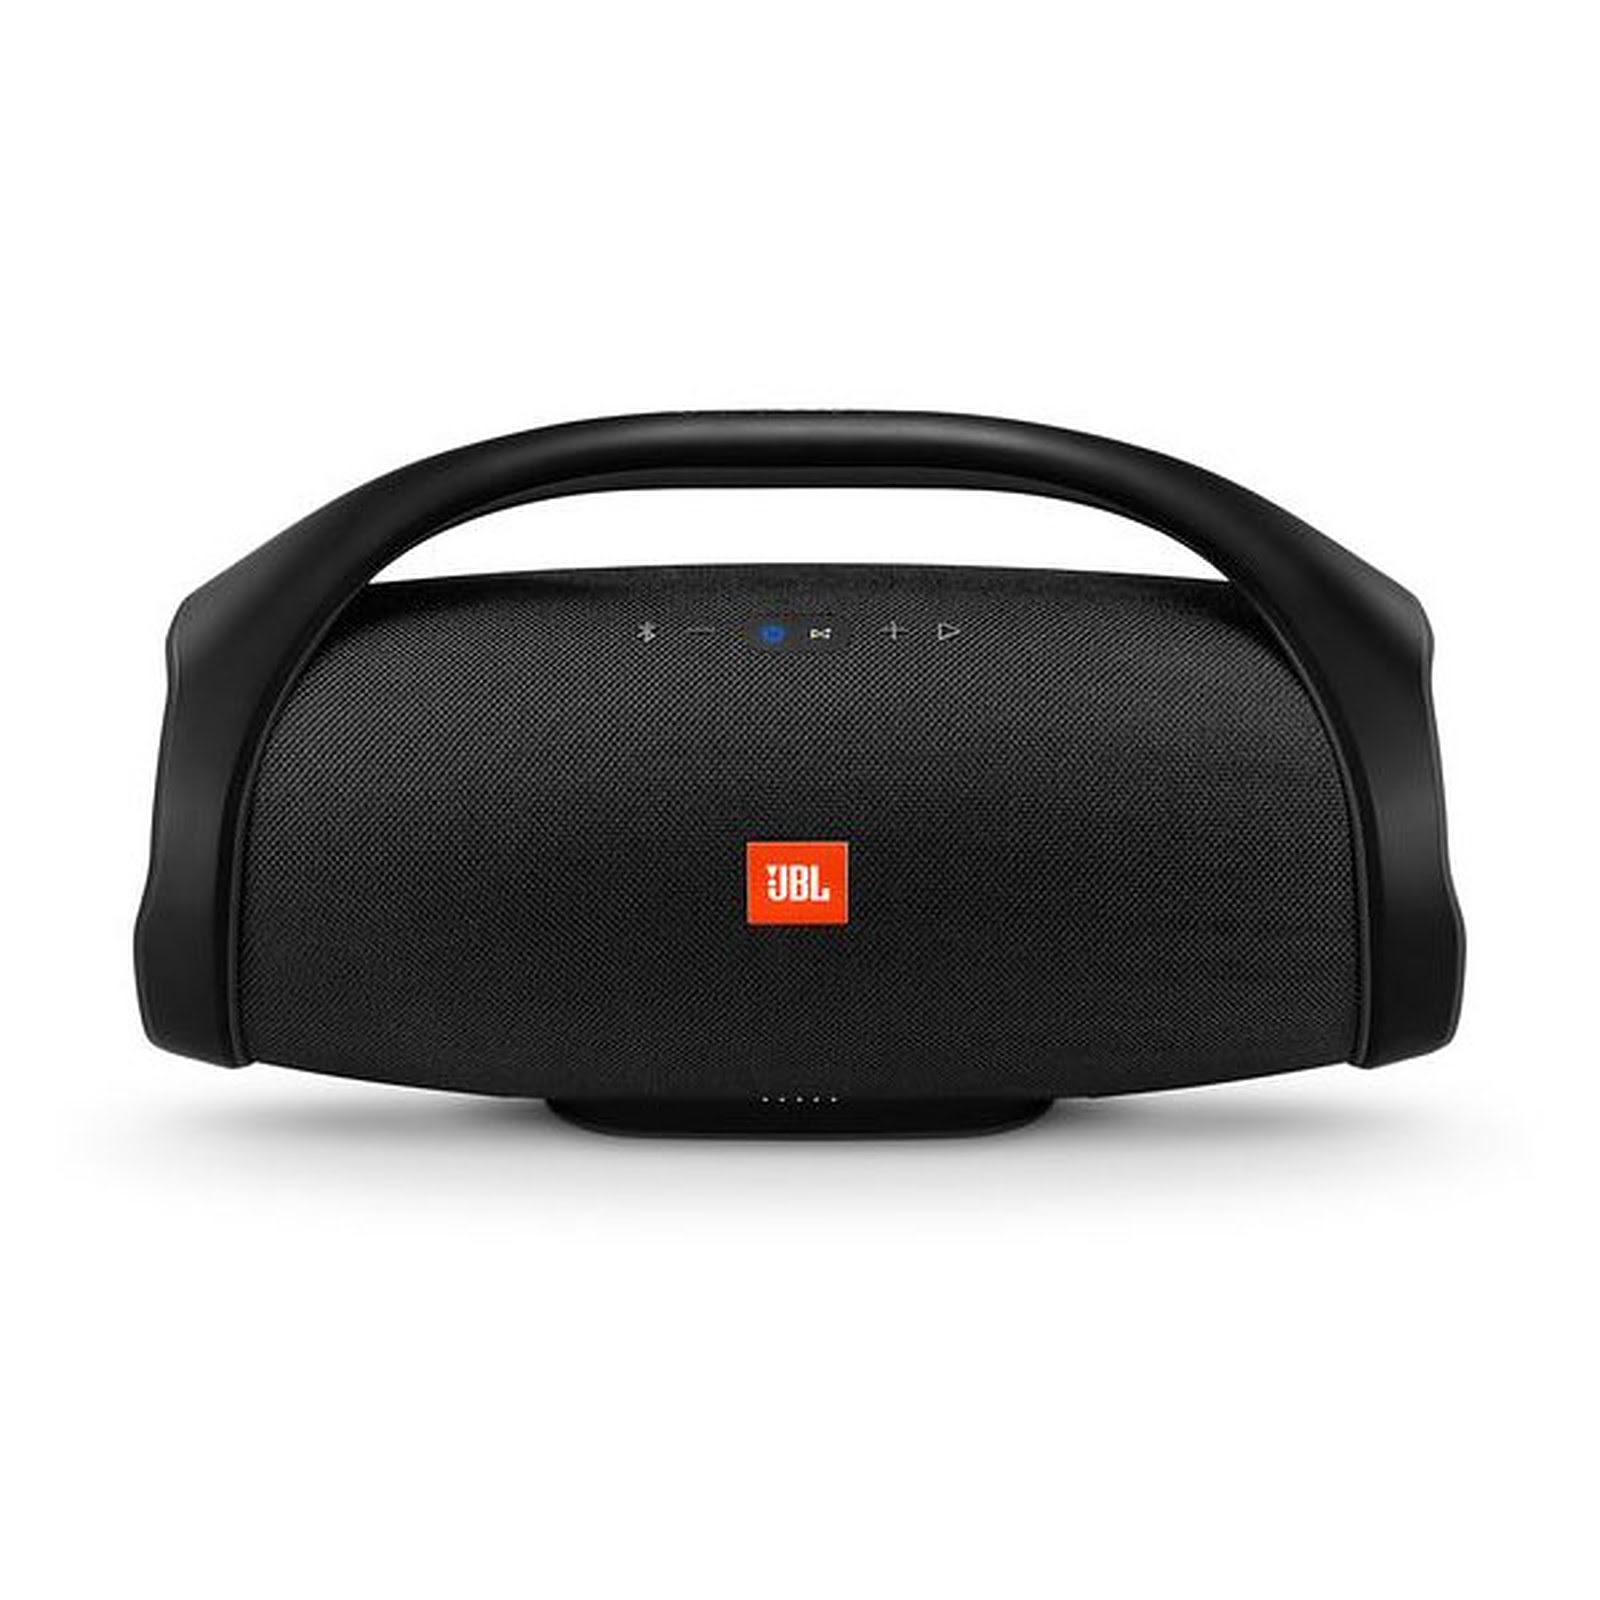 Boombox - Noir (JBLBOOMBOXBLKEU) - Achat / Vente Enceinte PC sur Picata.fr - 3